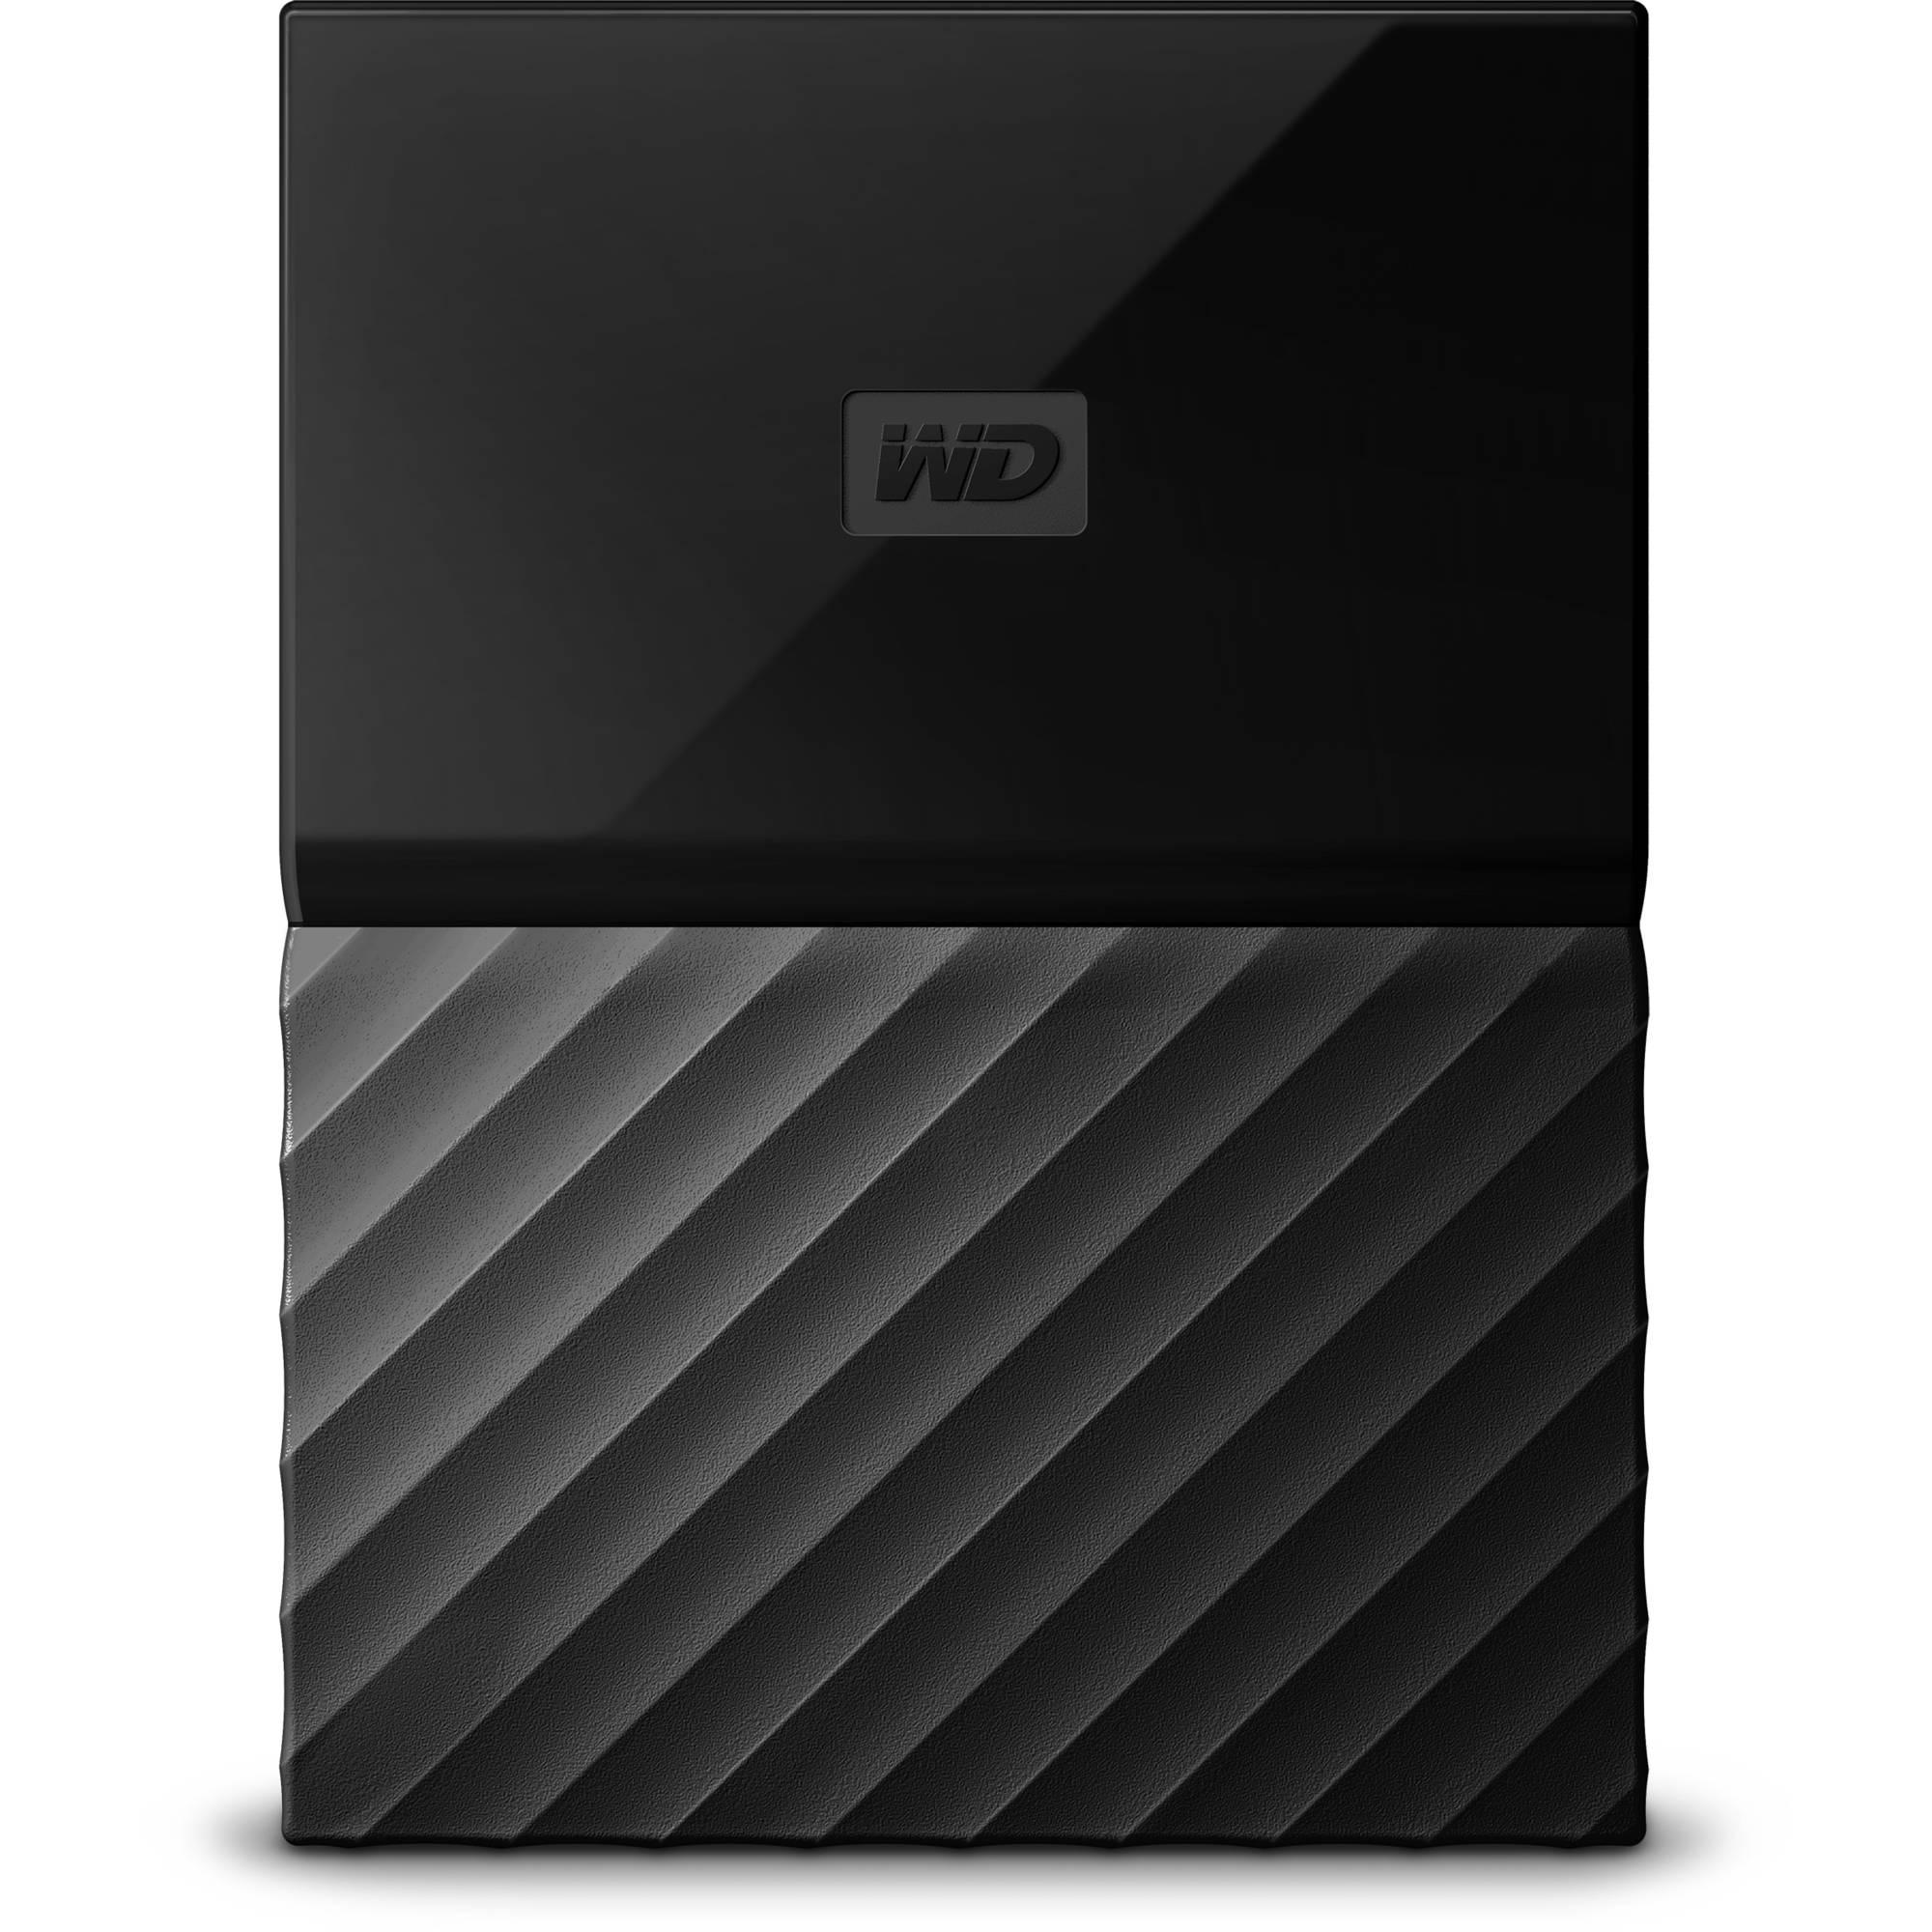 YMMV - 3TB Western Digital Portable Hard Drive - $54.00 - Clearance - WALMART In-Store Only -YMMV